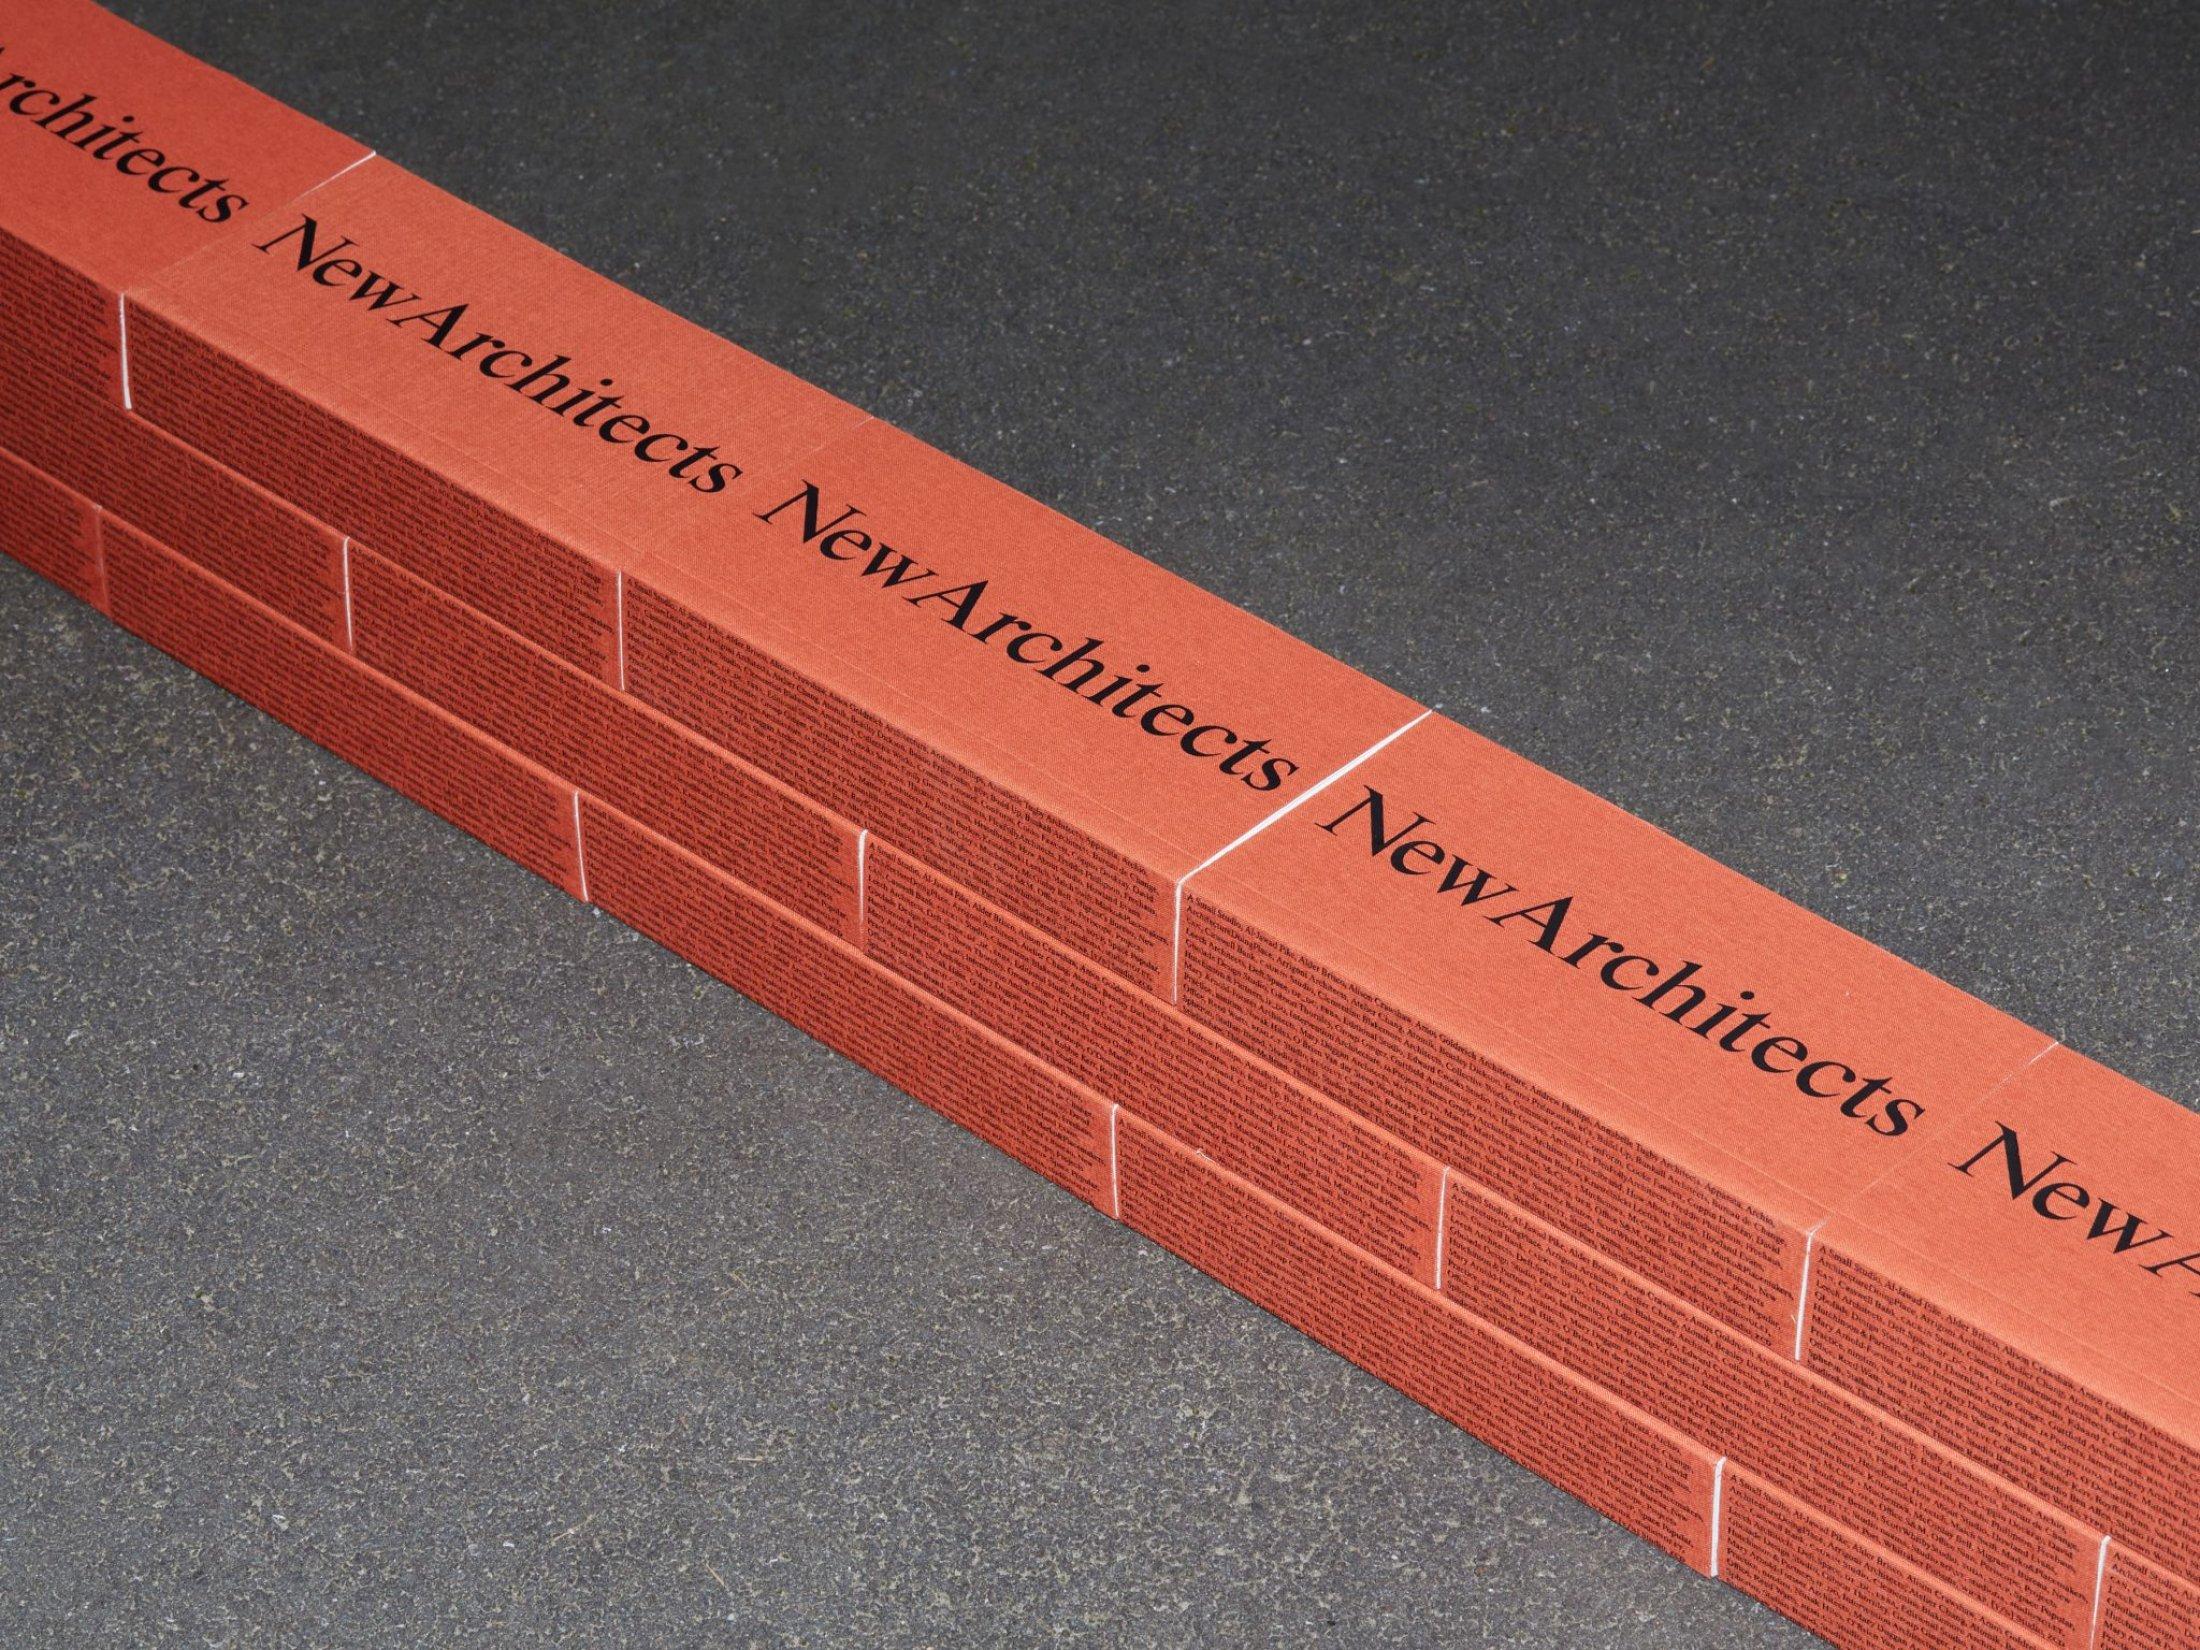 Thomas Adank - Architecture Foundation, New Architects 4